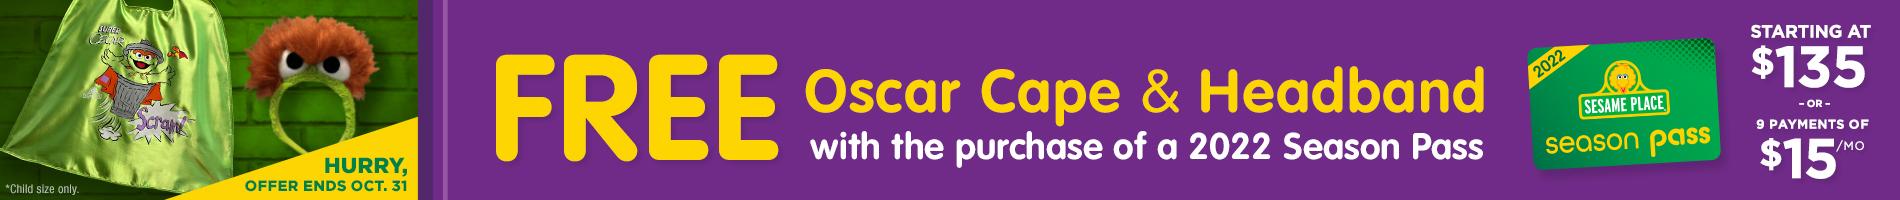 Buy a 2022 Season Pass and get a FREE Oscar Cap & Headband